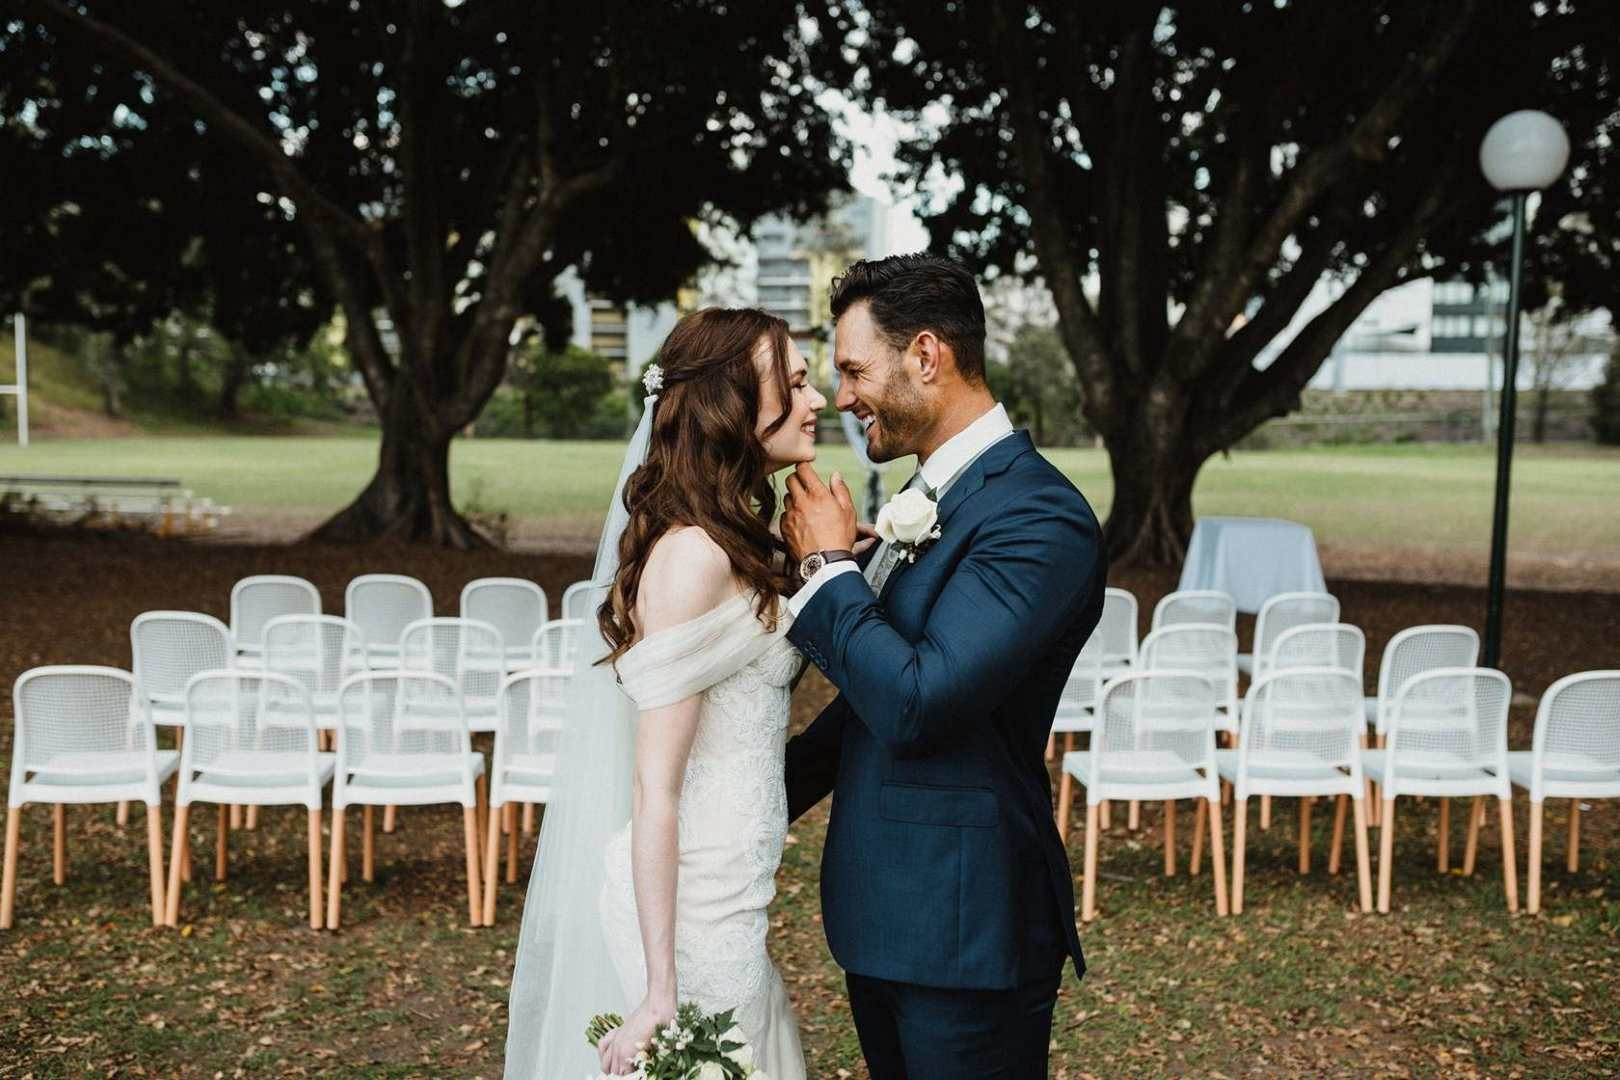 Wedding Venue - Figs on Sylvan 1 on Veilability